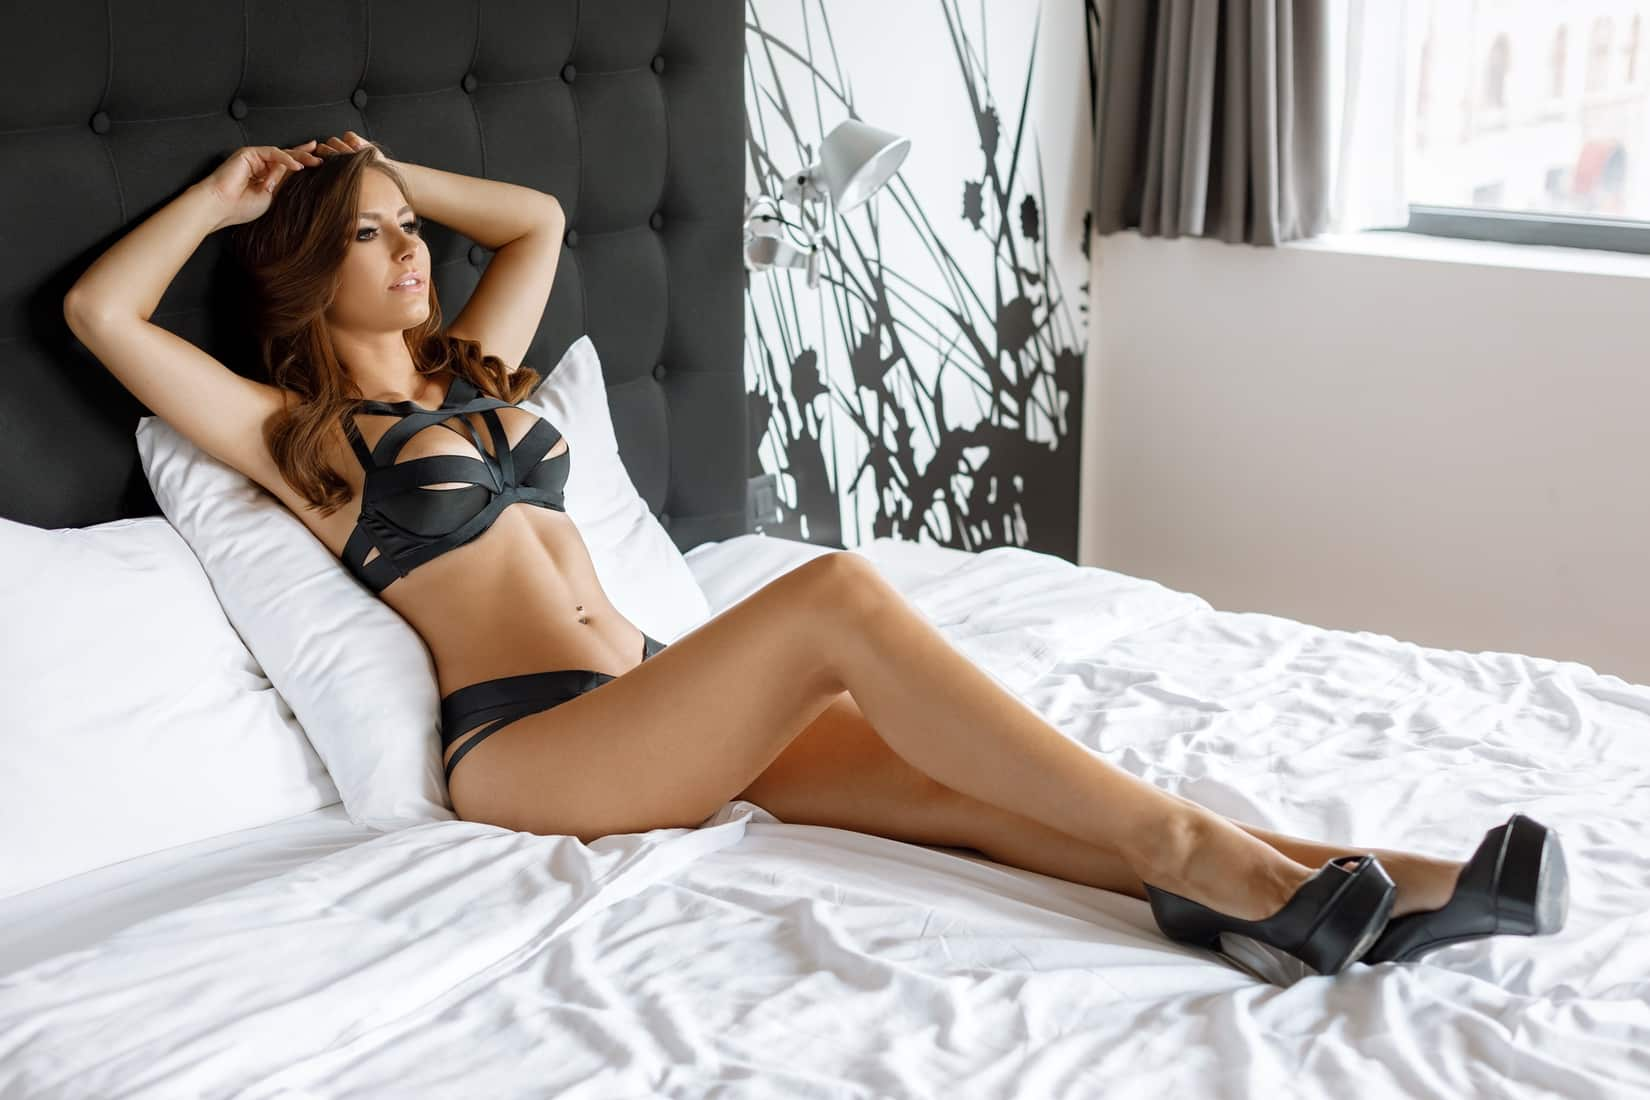 Aviana Belgravia Escort